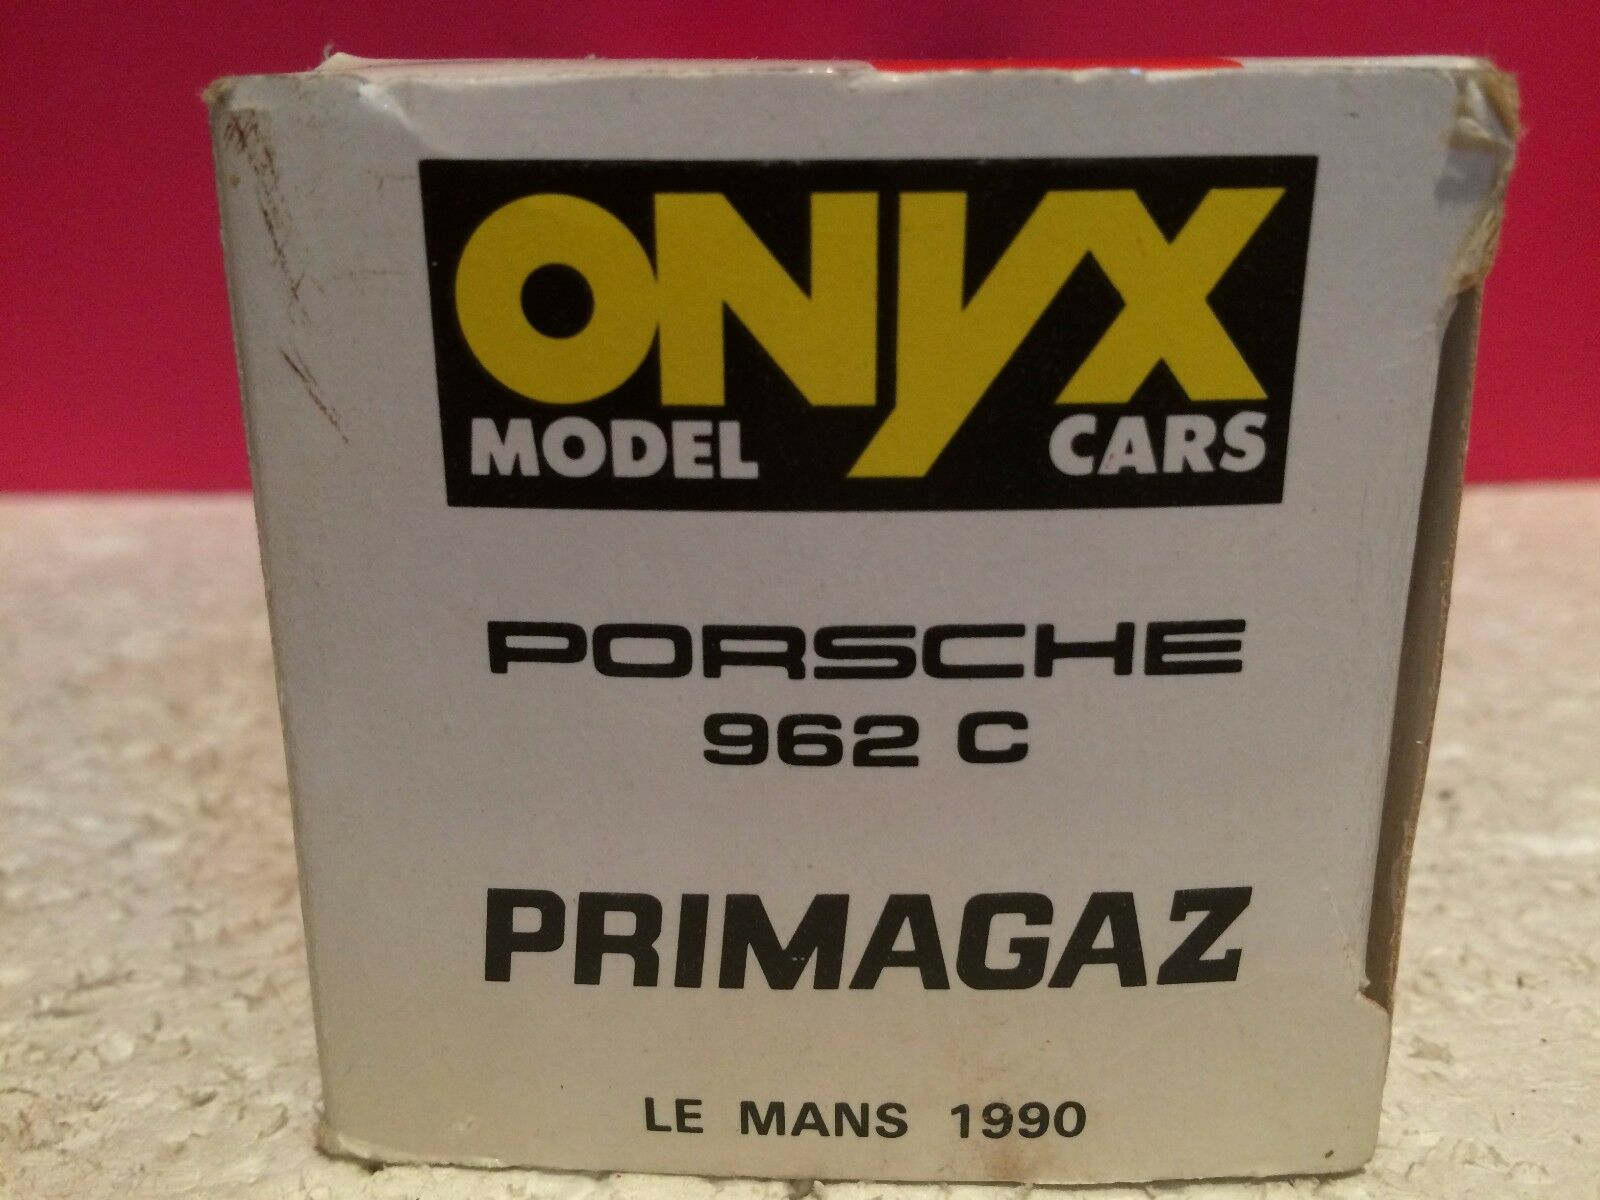 ONYX ONYX ONYX SUPERBE PORSCHE 962C PRIMAGAZ LE MANS 1990 NEUF EN BOITE 1 43 80ca64